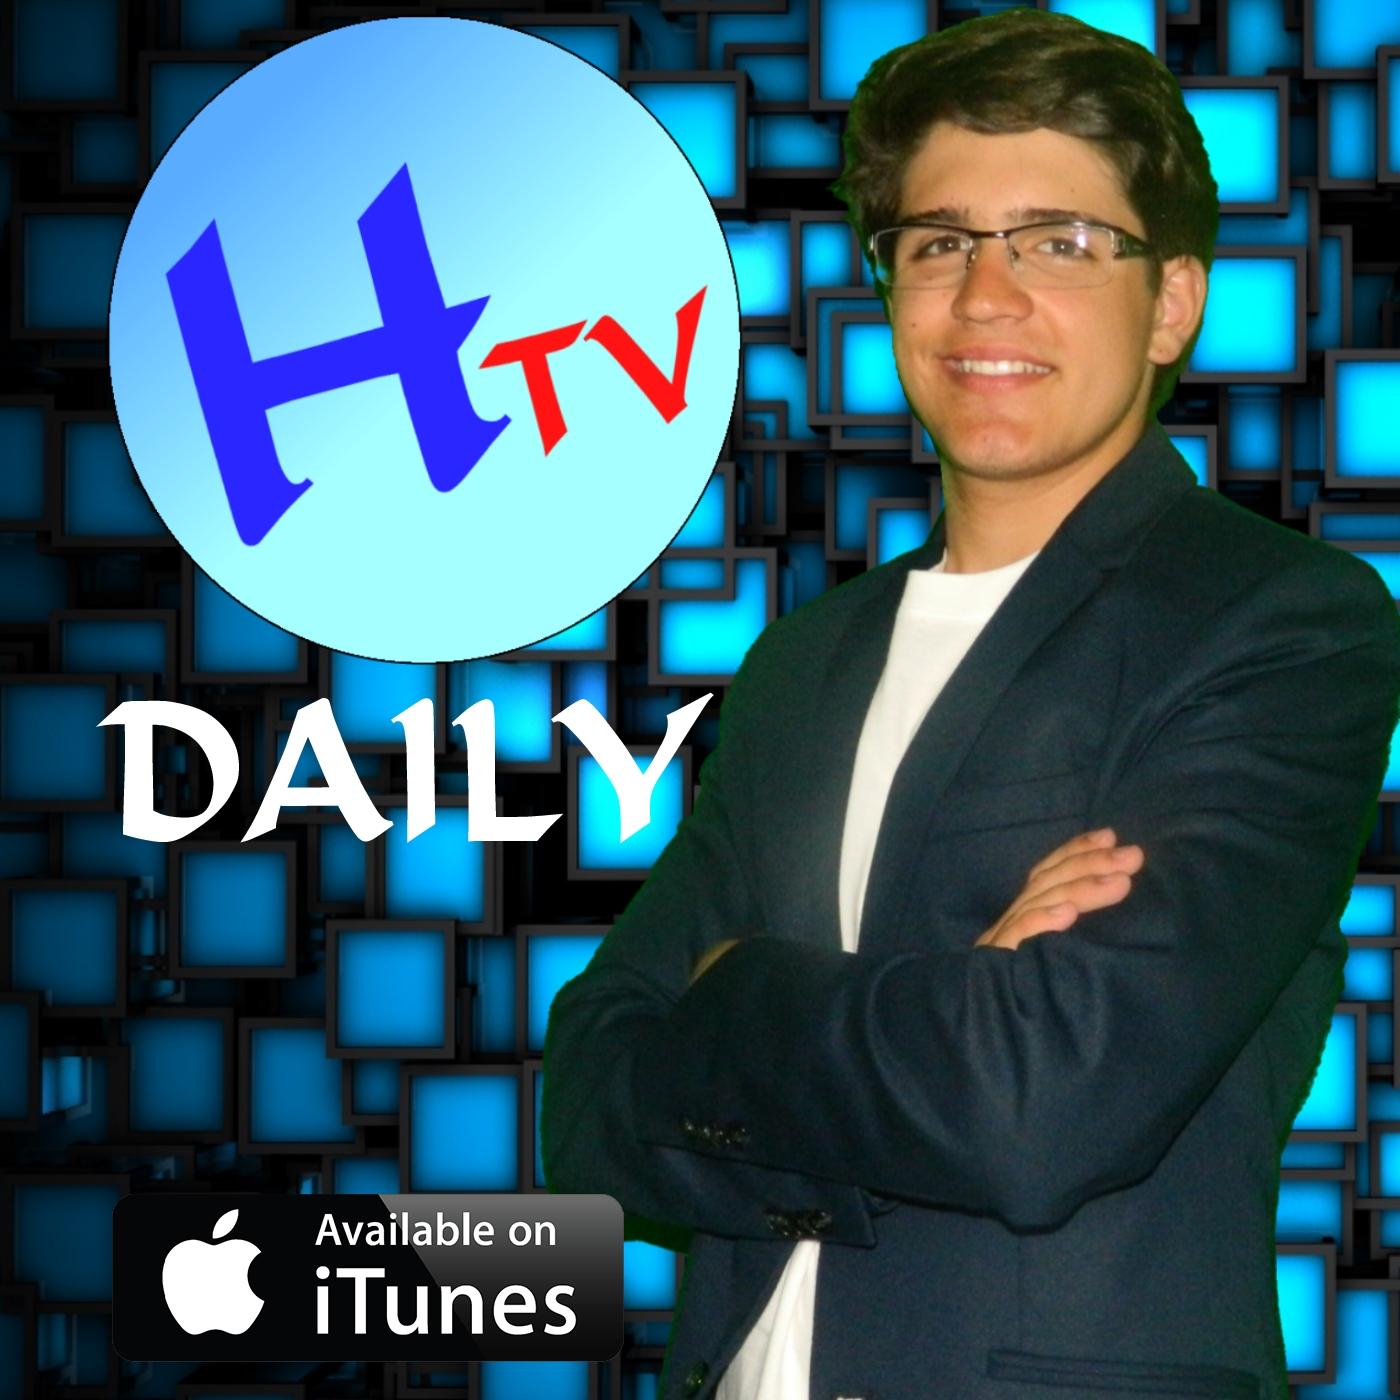 Habitantes TV Daily